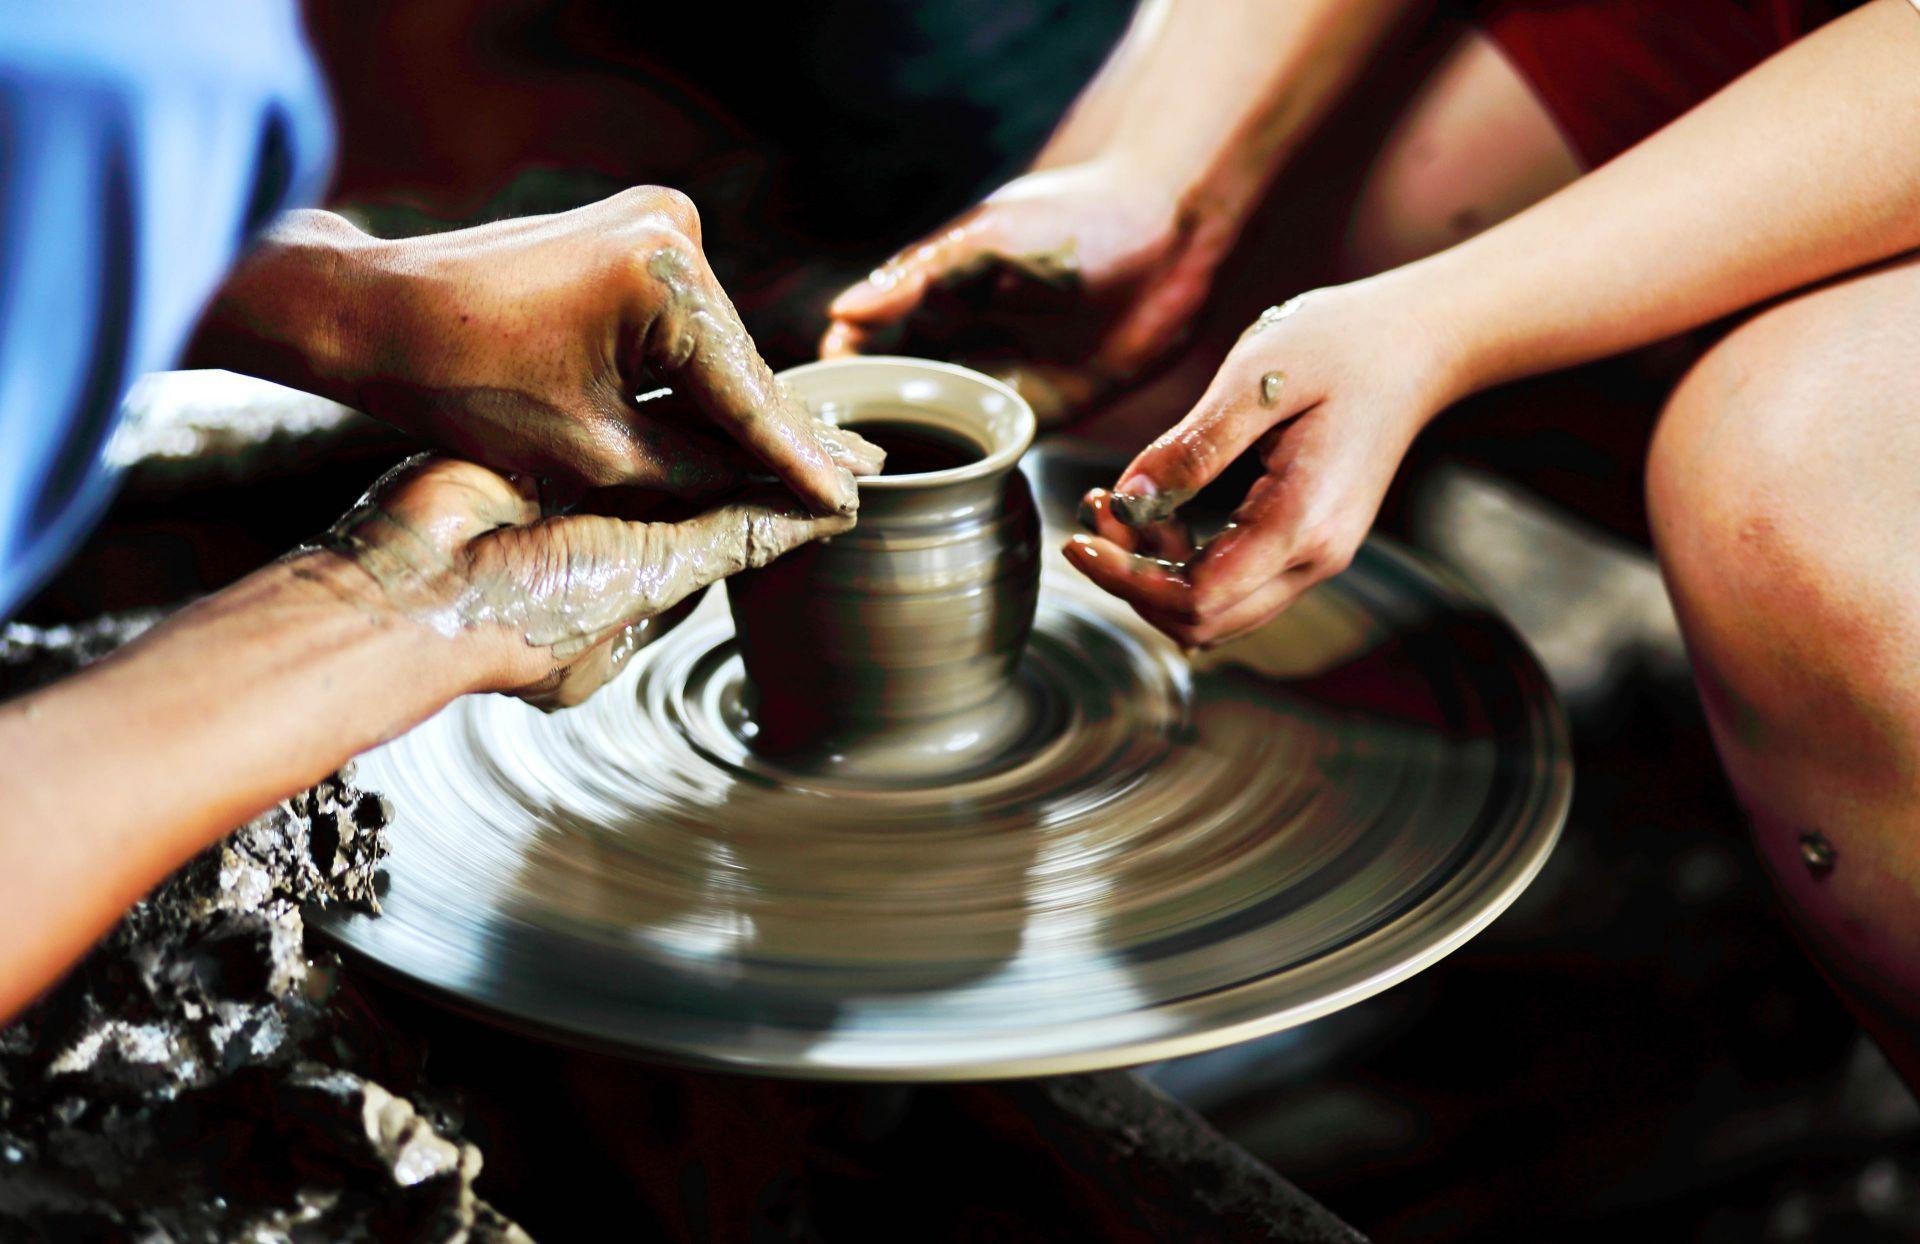 Greece workshops: Pottery